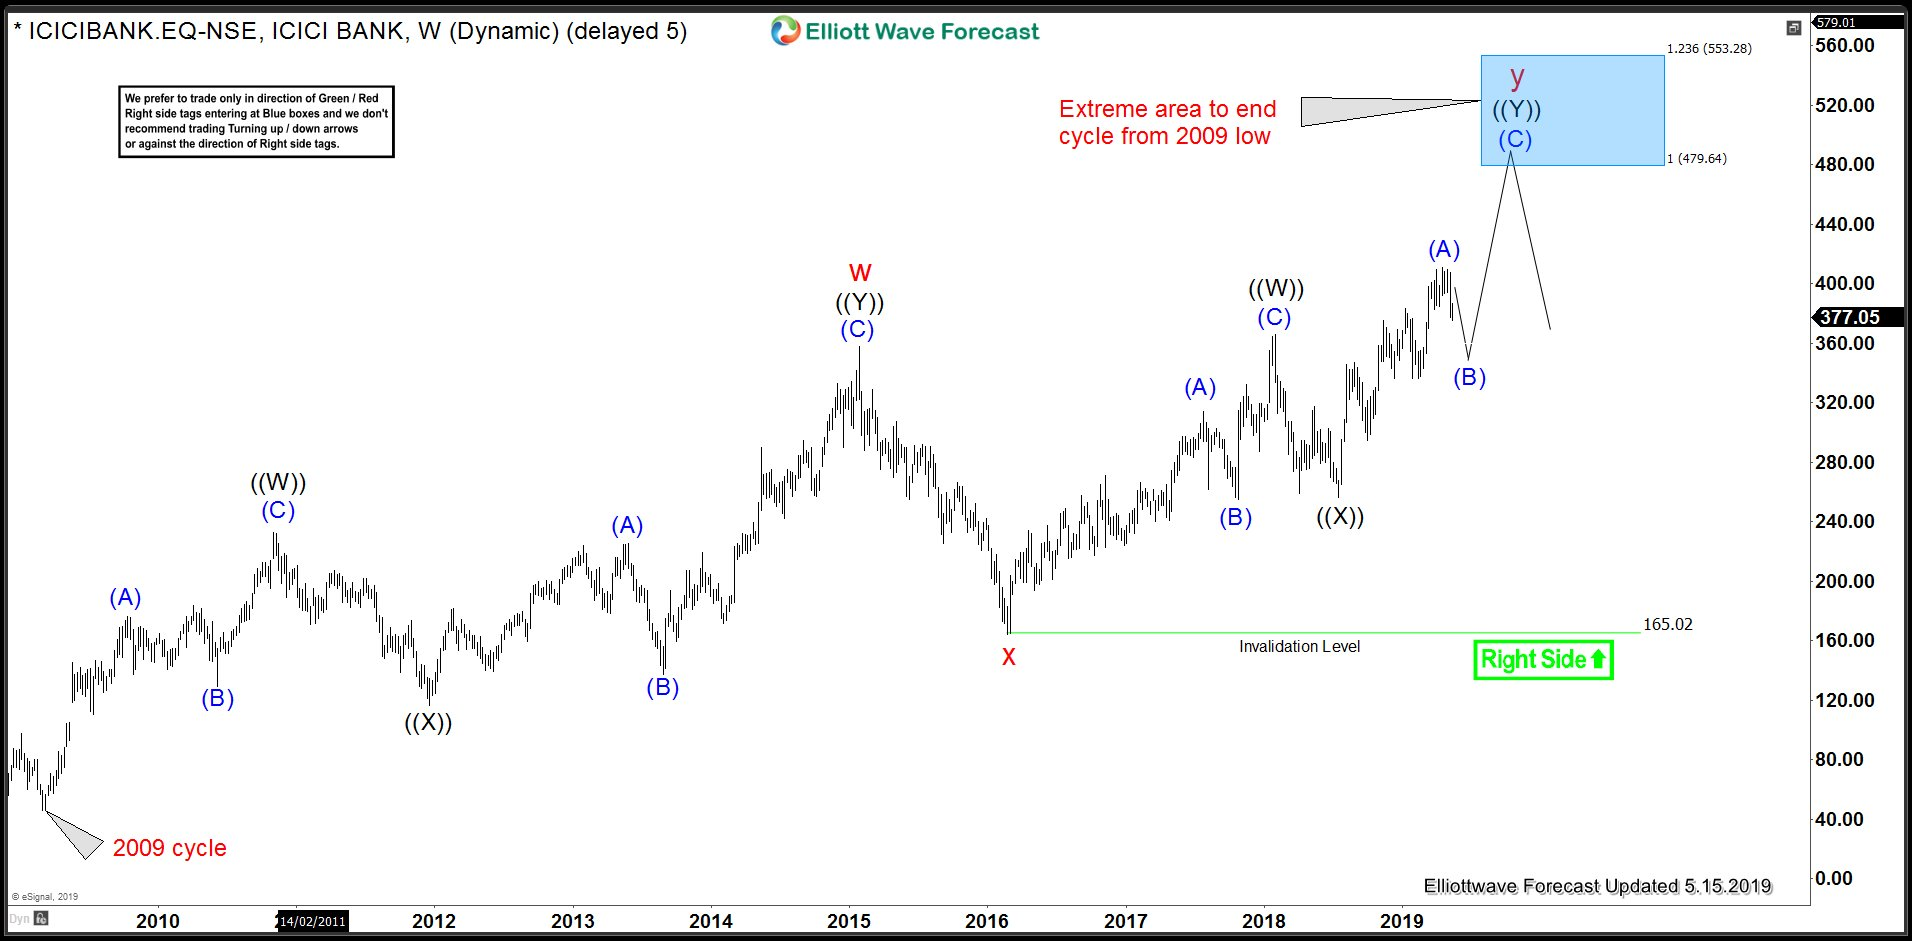 ICIC Bank Weekly Elliott Wave Chart